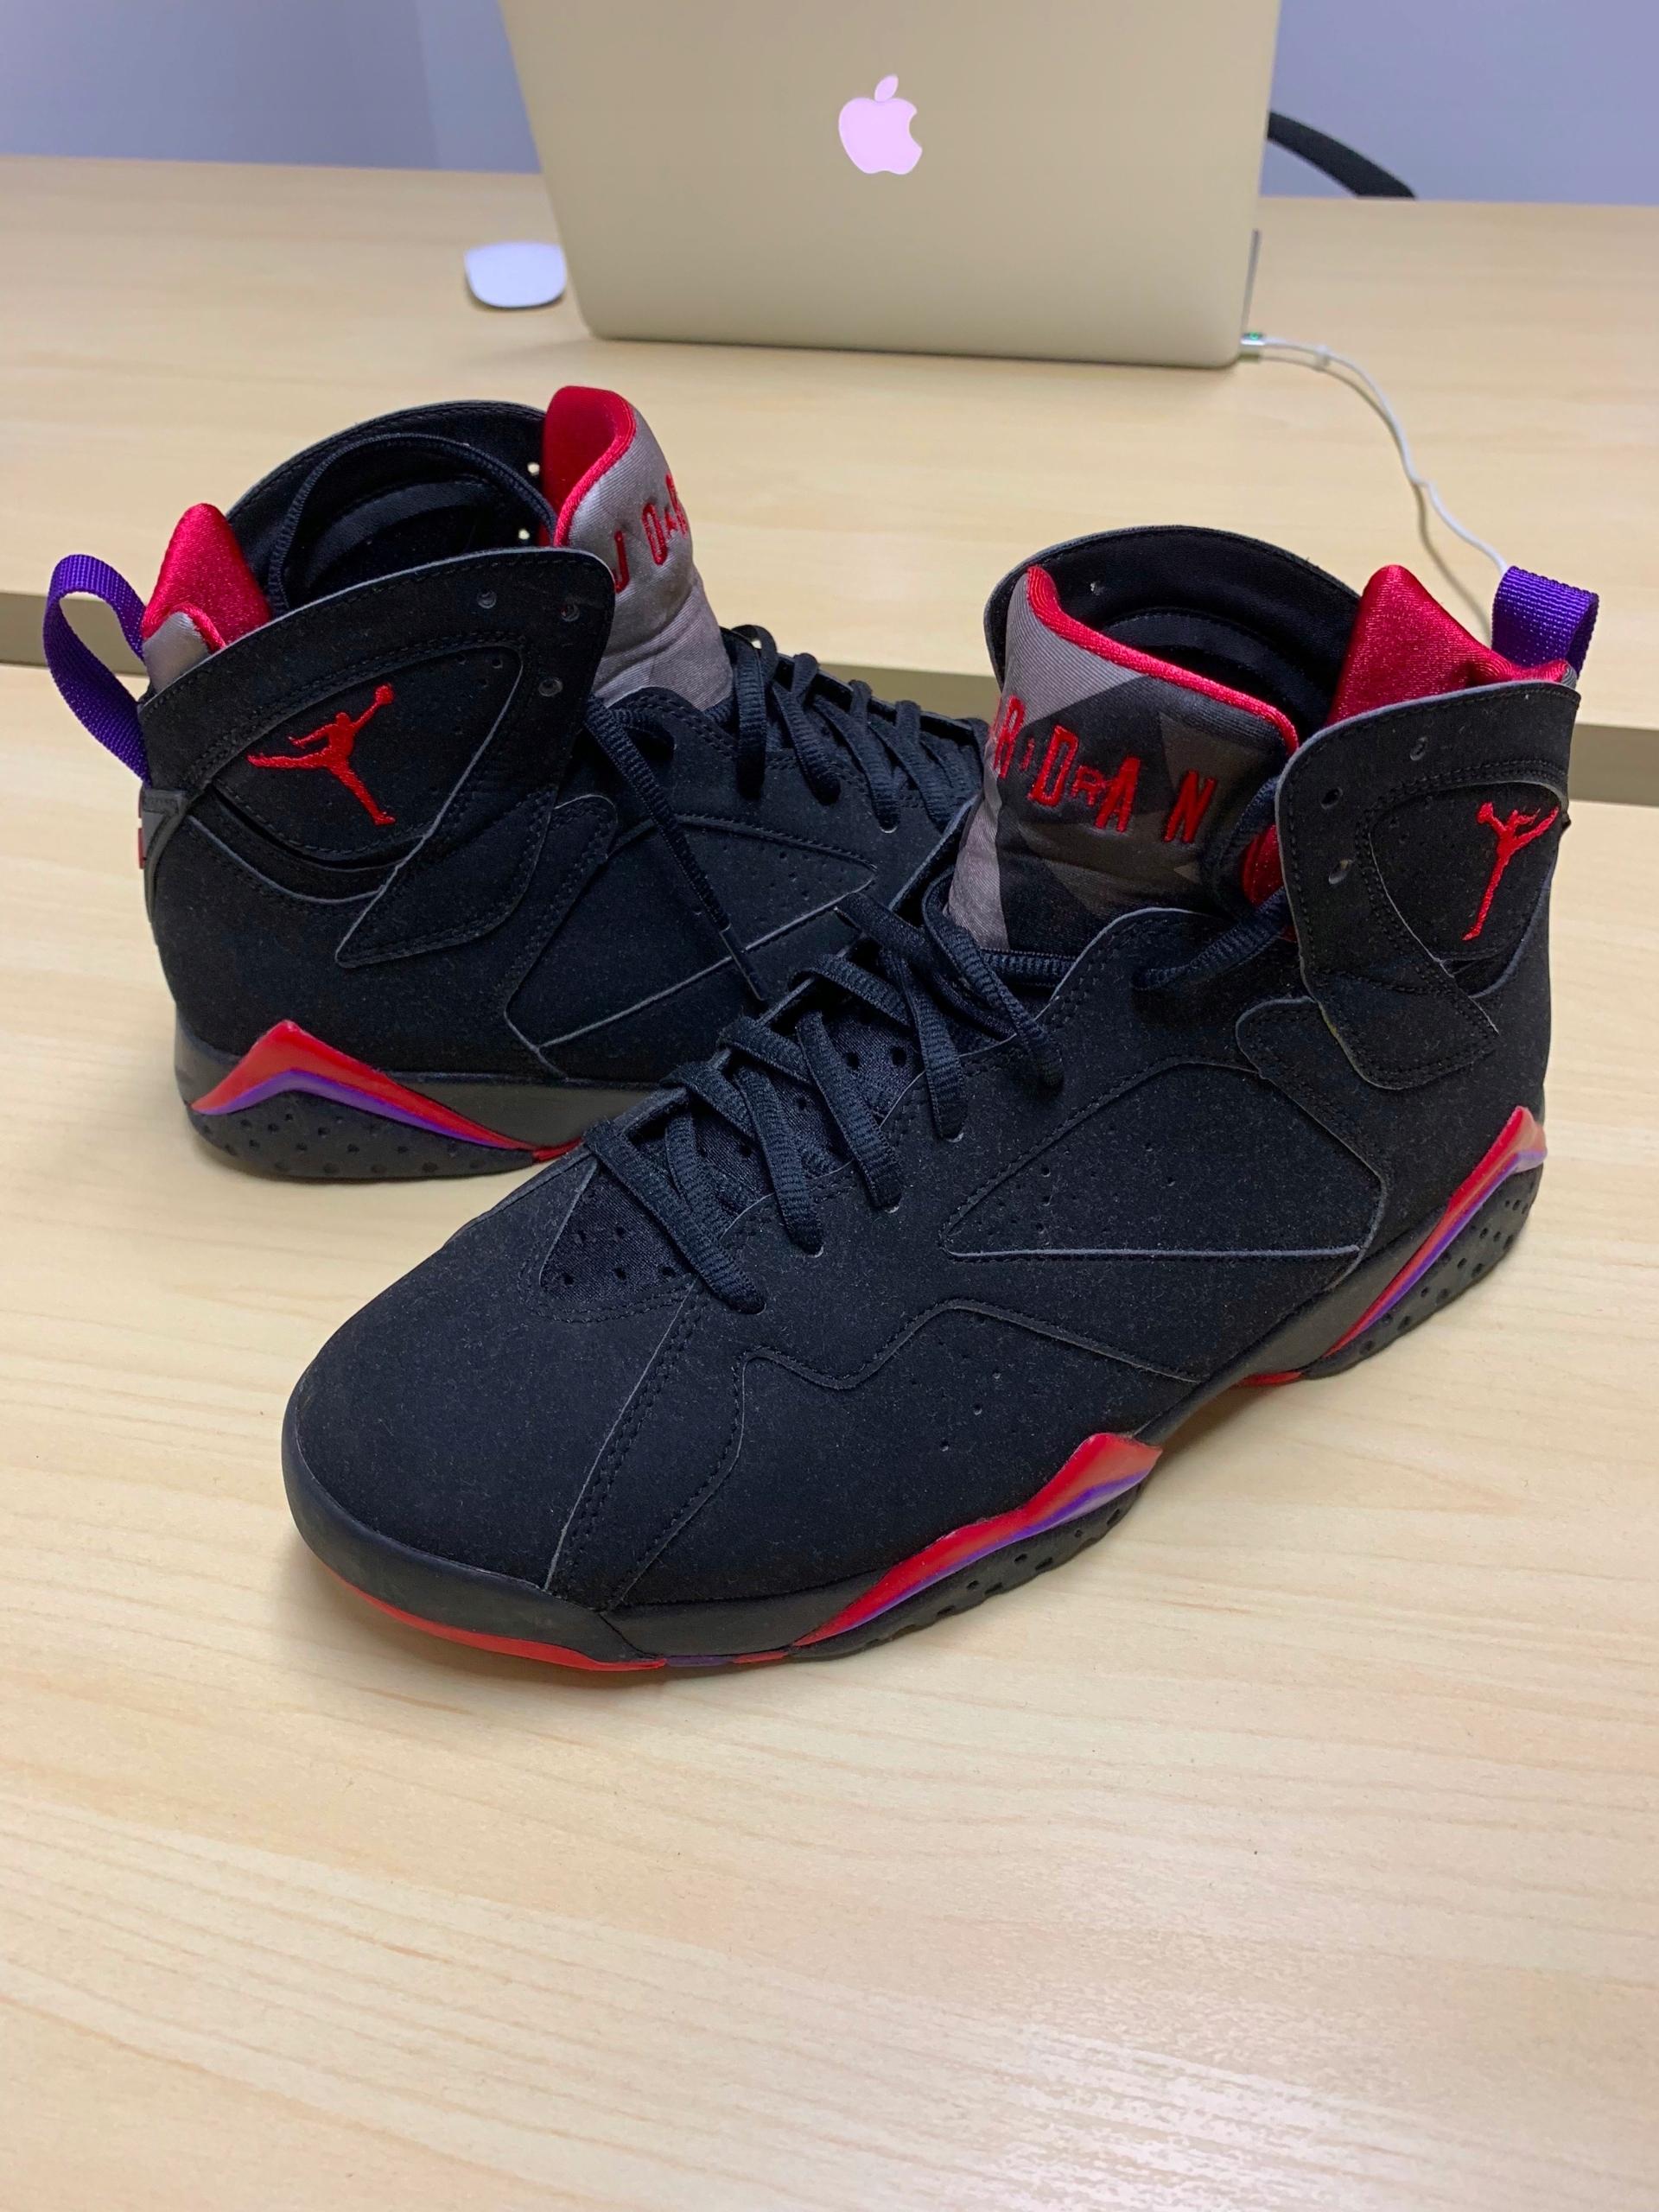 buy popular 27c17 155f5 Nike Air Jordan 7 Retro